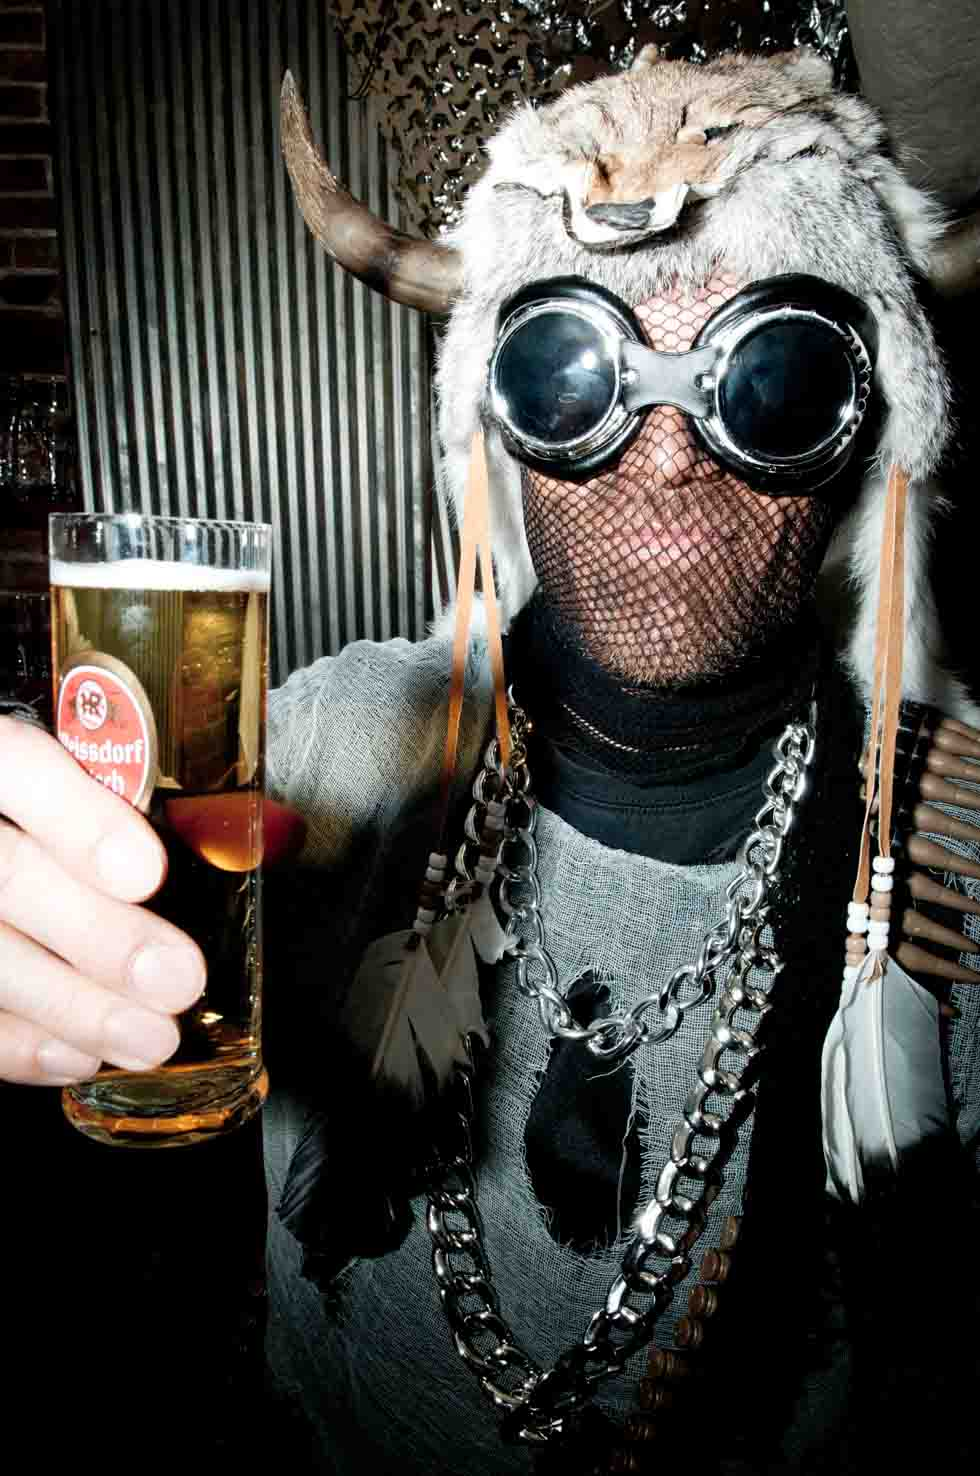 zum-schneider-nyc-2012-karneval-apocalyptika-3240.jpg